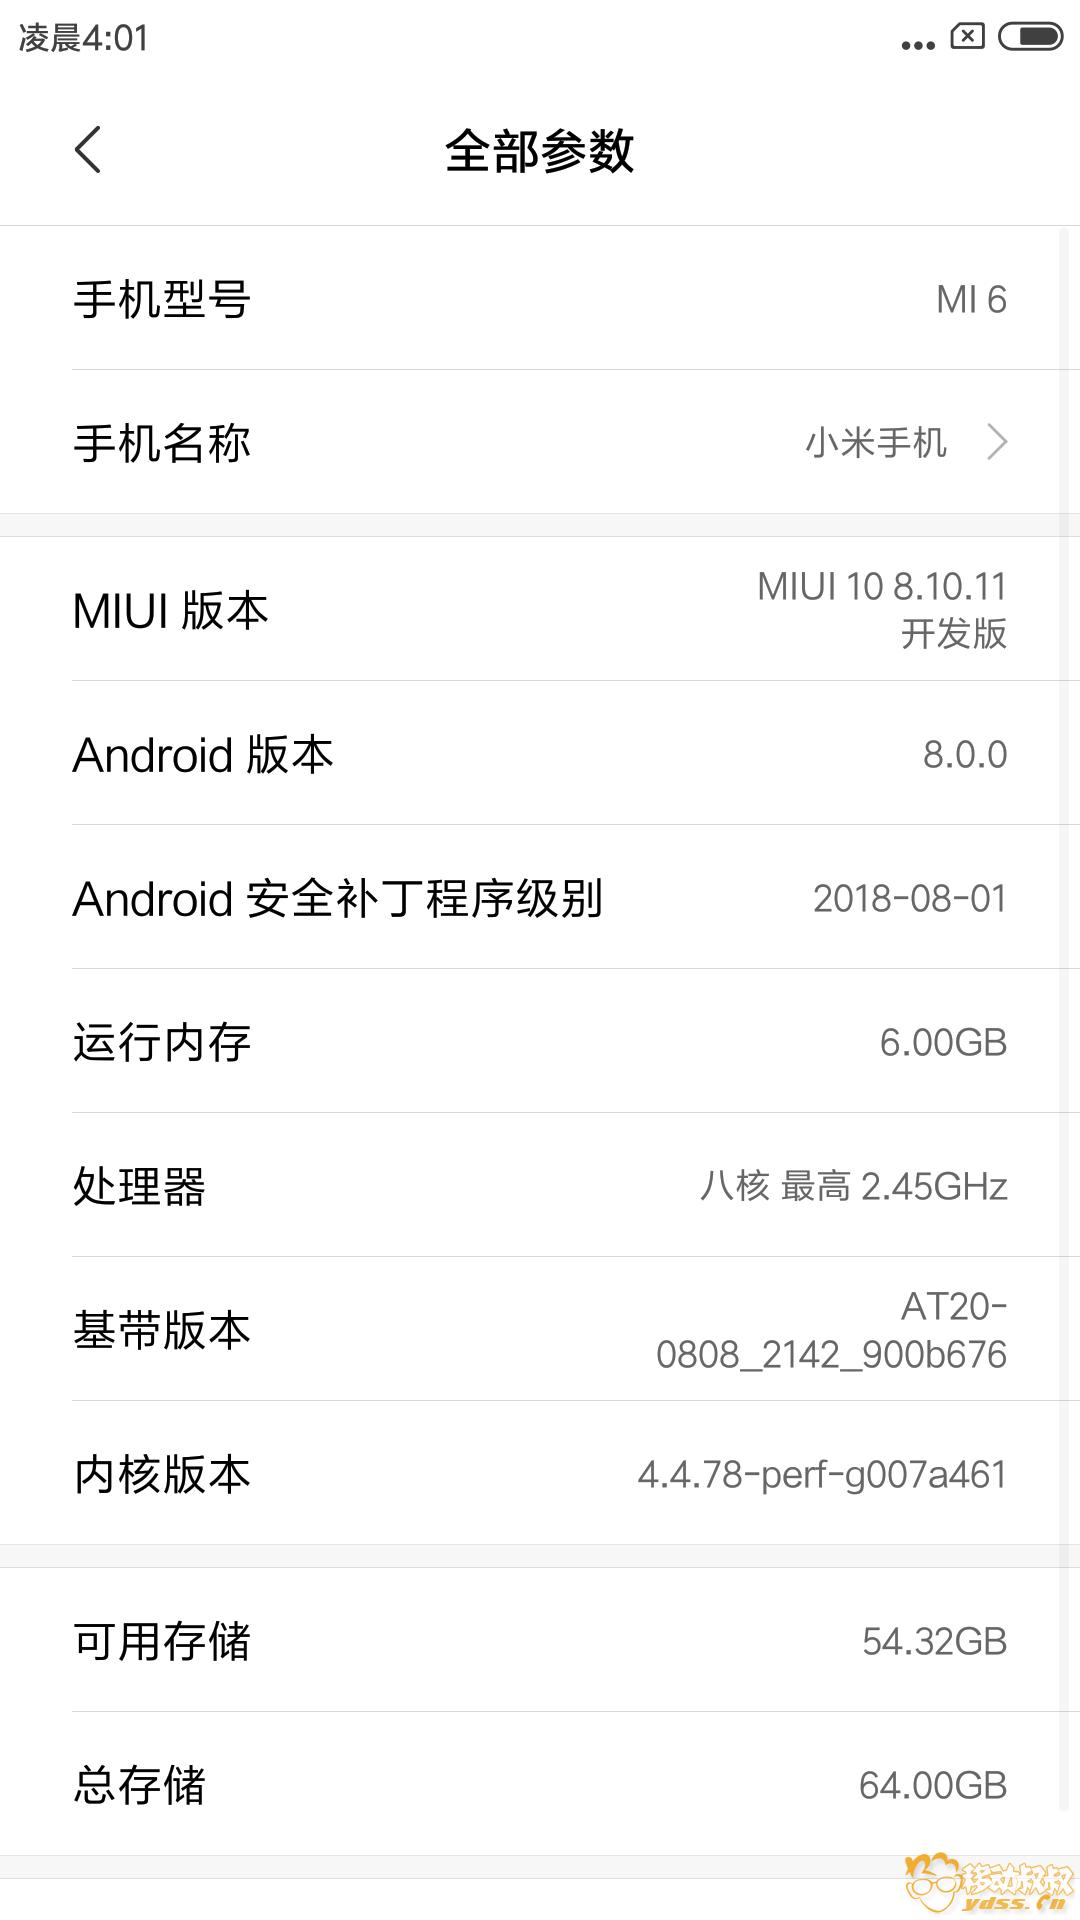 Screenshot_1971-03-29-04-01-31-606_com.android.settings.png